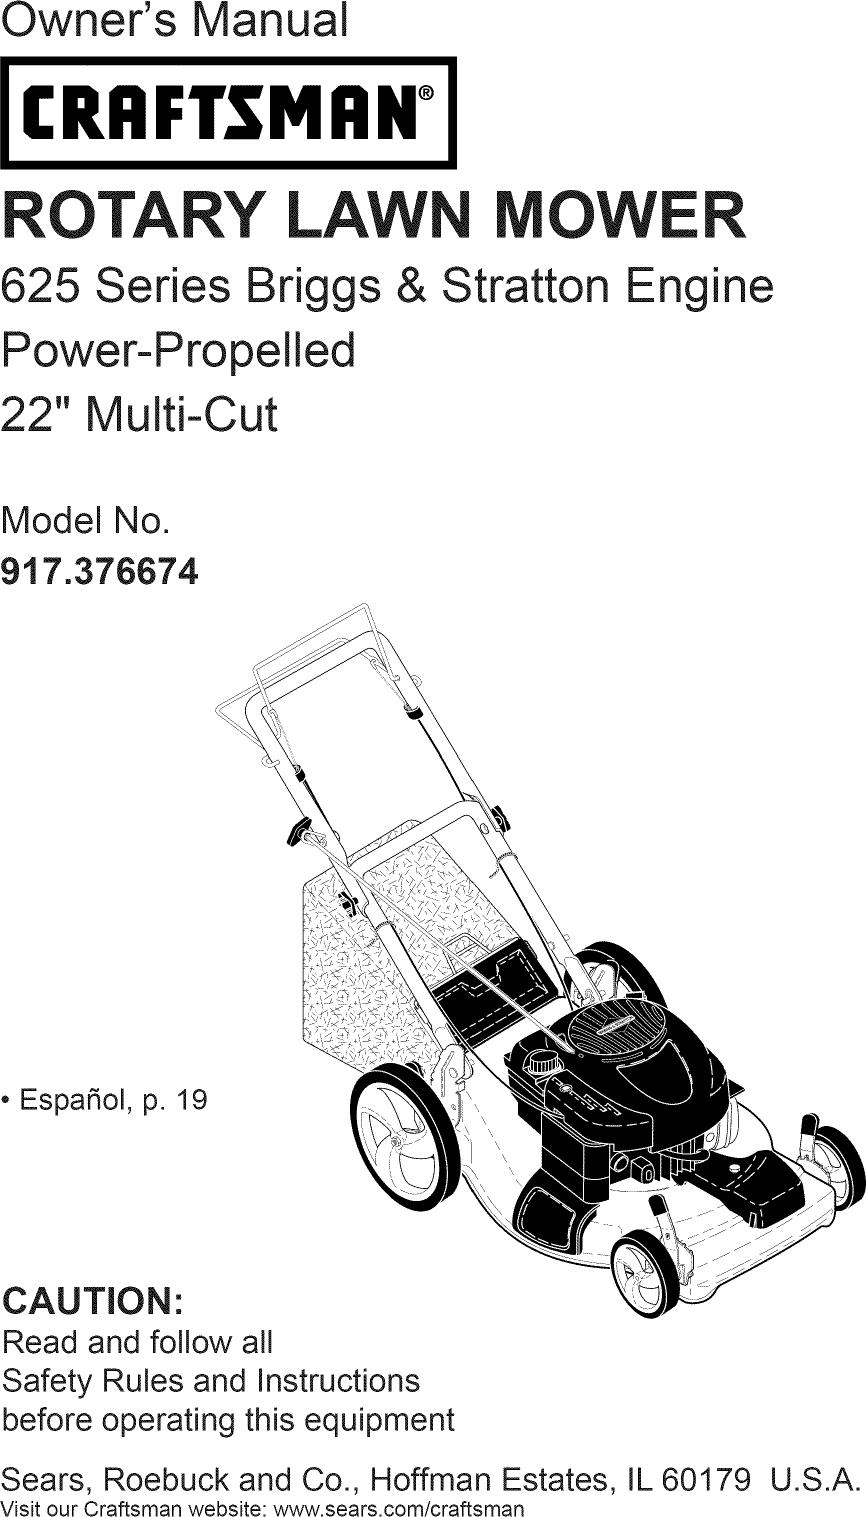 Craftsman 917376674 User Manual LAWN MOWER Manuals And